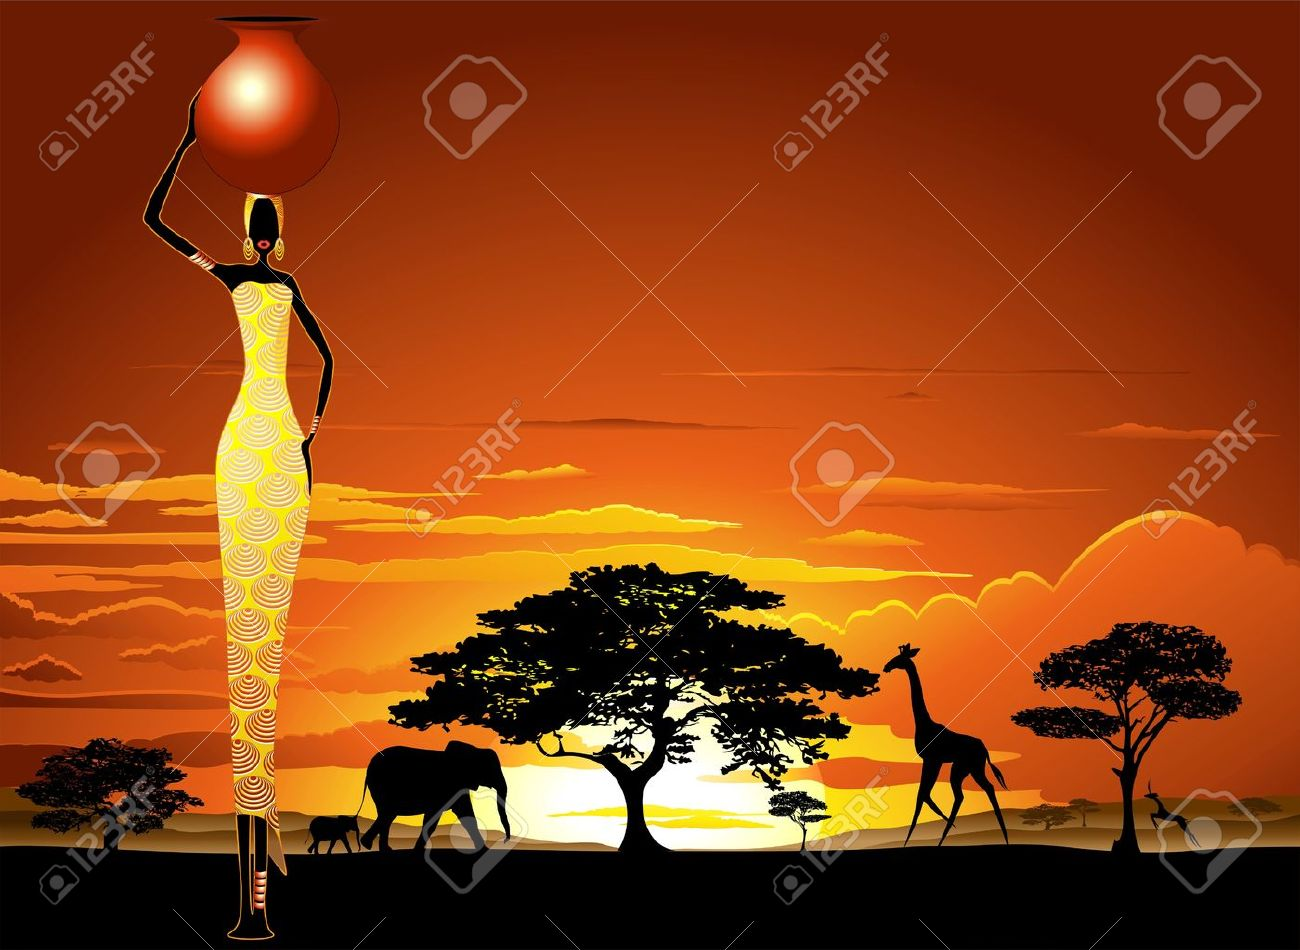 African Woman on Bright Savannah Sunset Stock Vector - 20282340